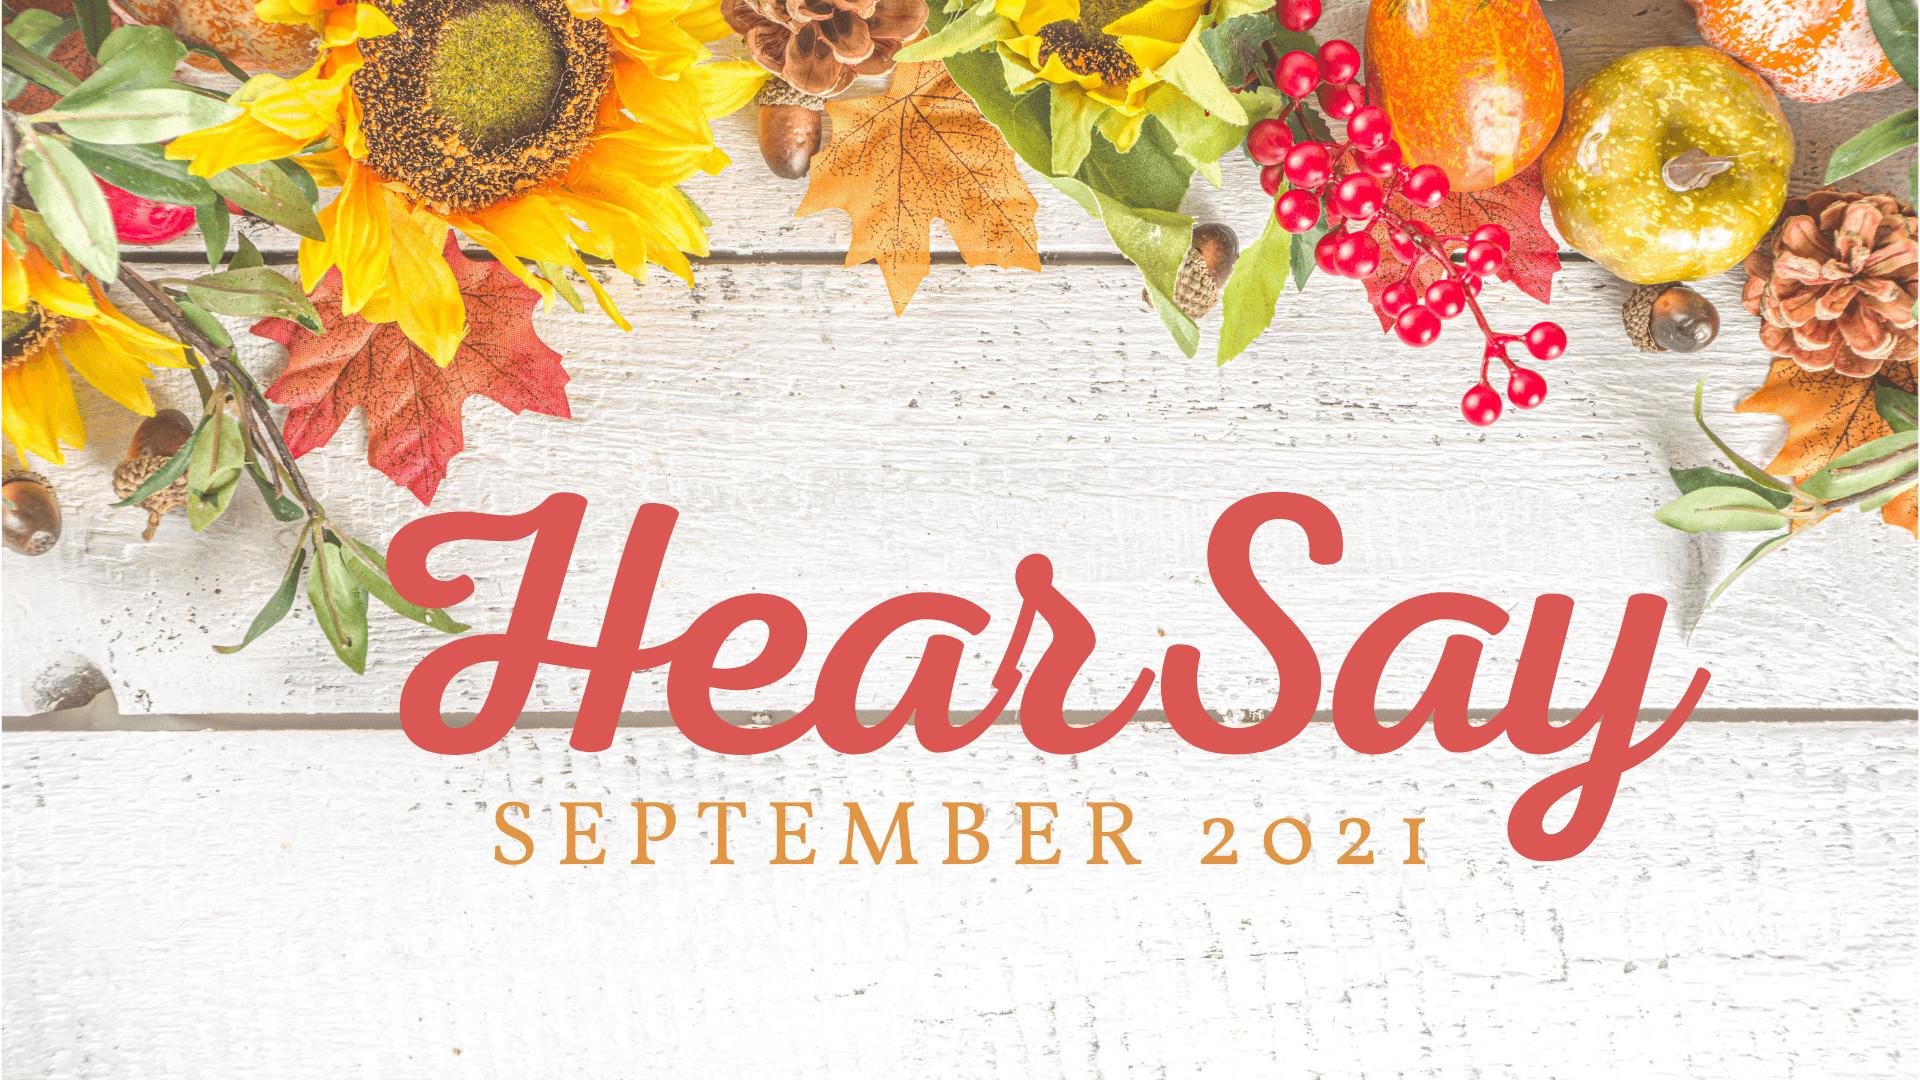 HearSay - September 2021